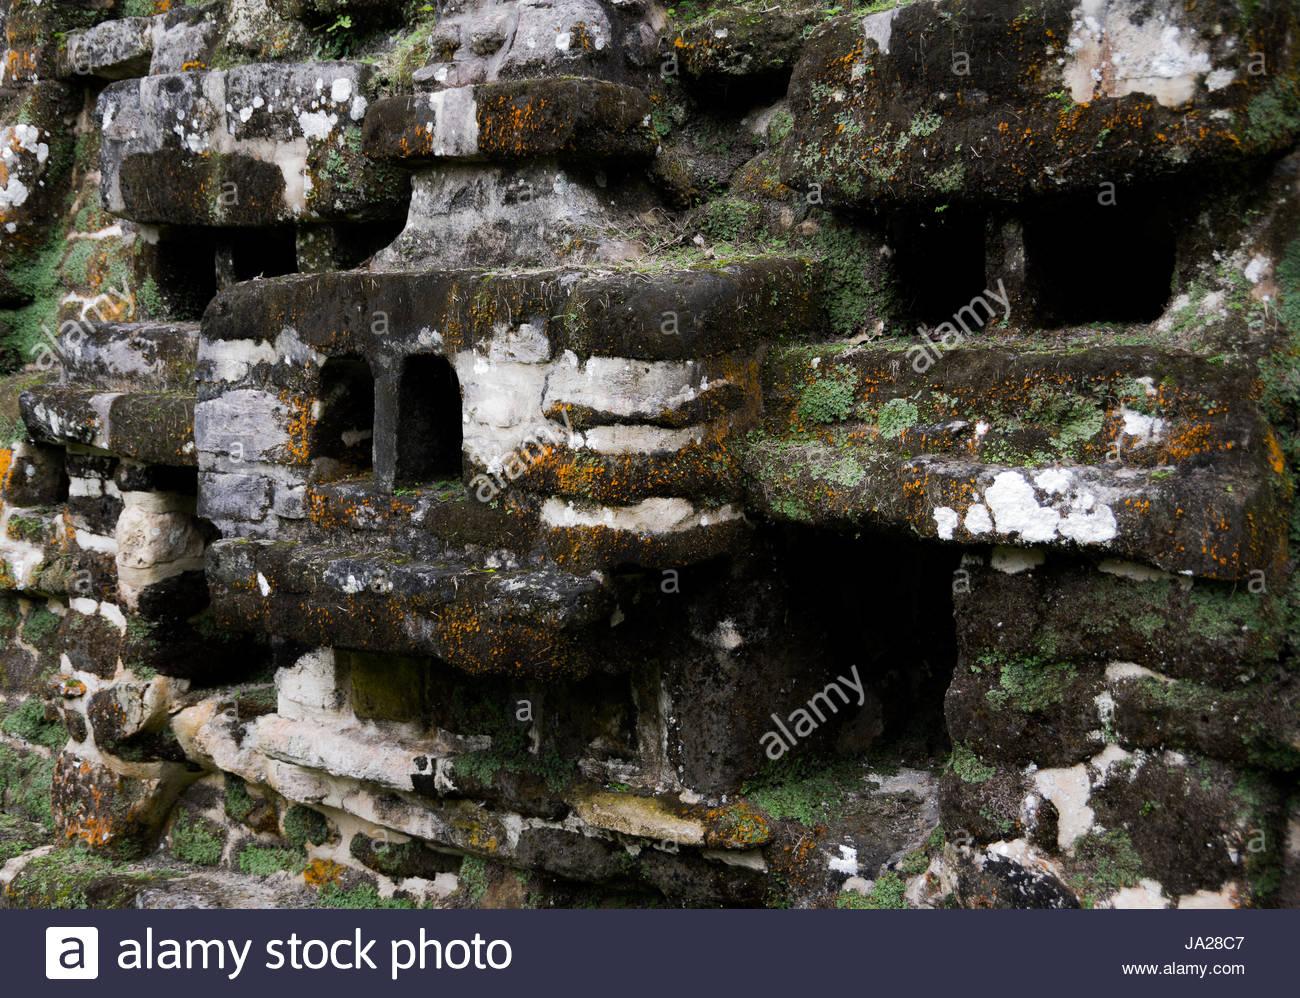 The Mayan ruins of Lamanai, in the Orange Walk district of Belize - Stock Image